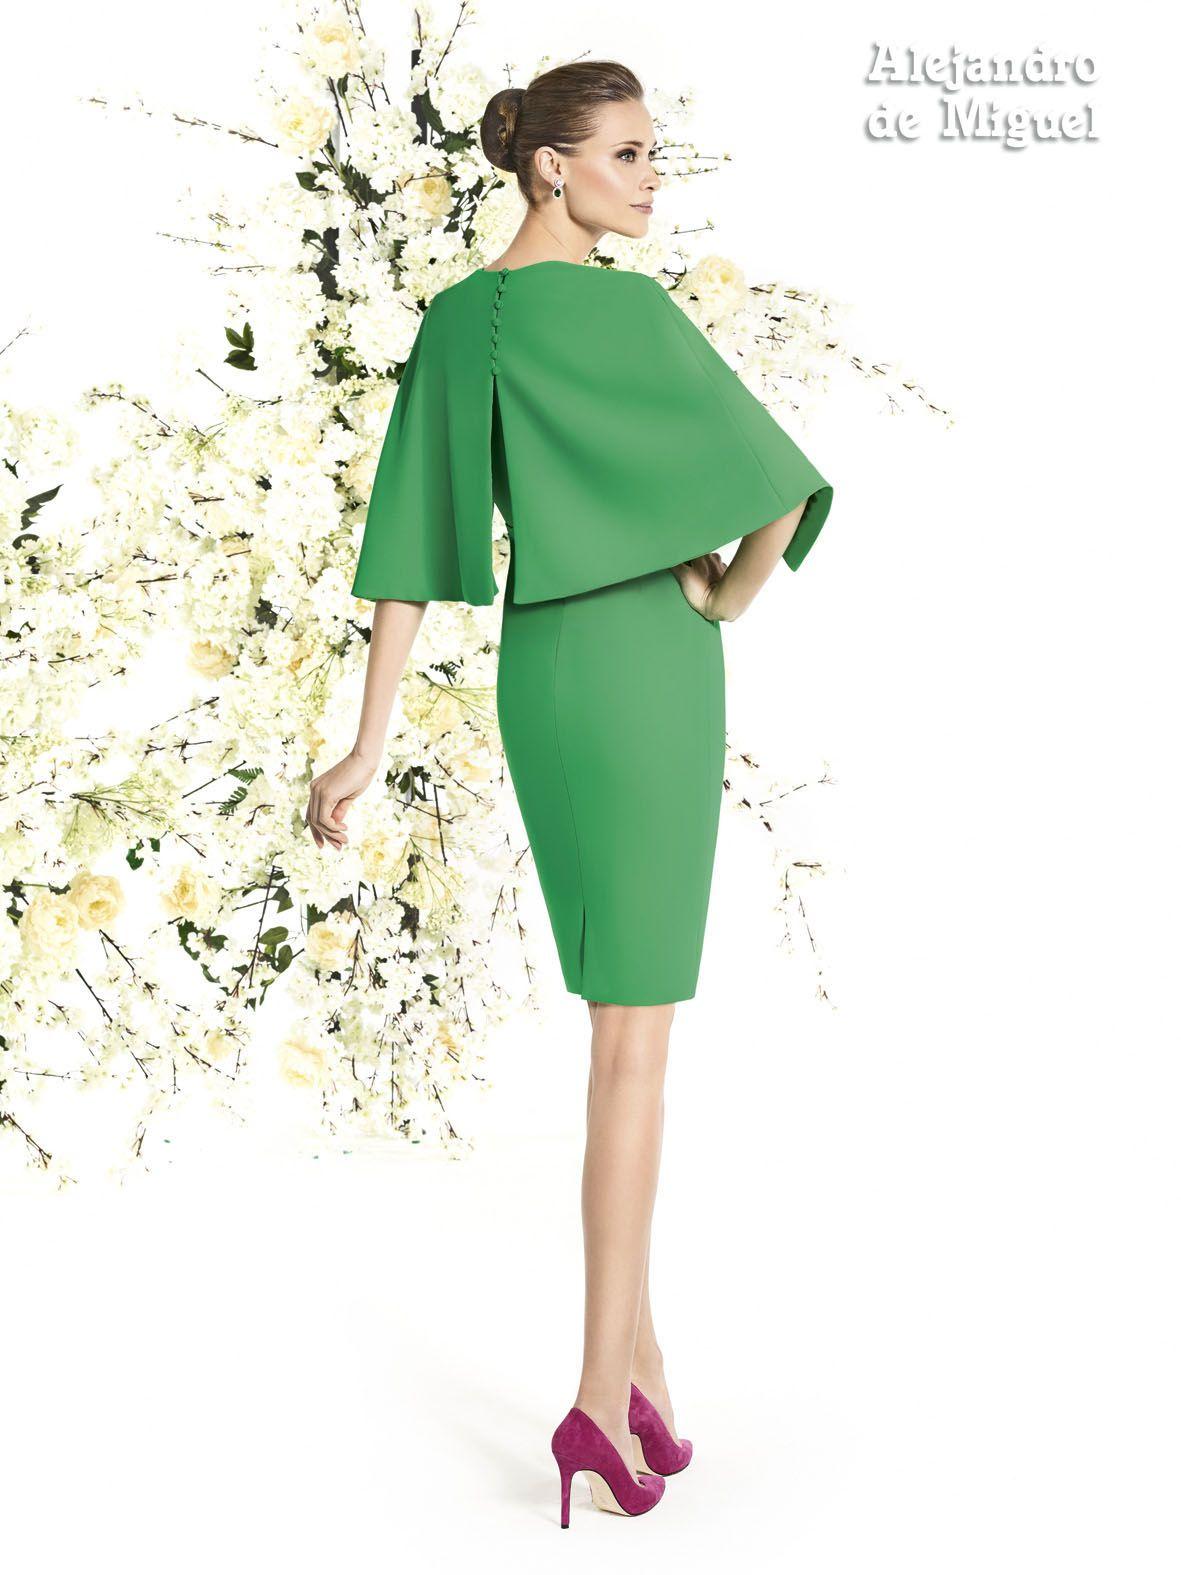 1d6d6ddd1d Alejandro de Miguel | Vestido Corto – mod. 790 | Dresses | Vestidos ...